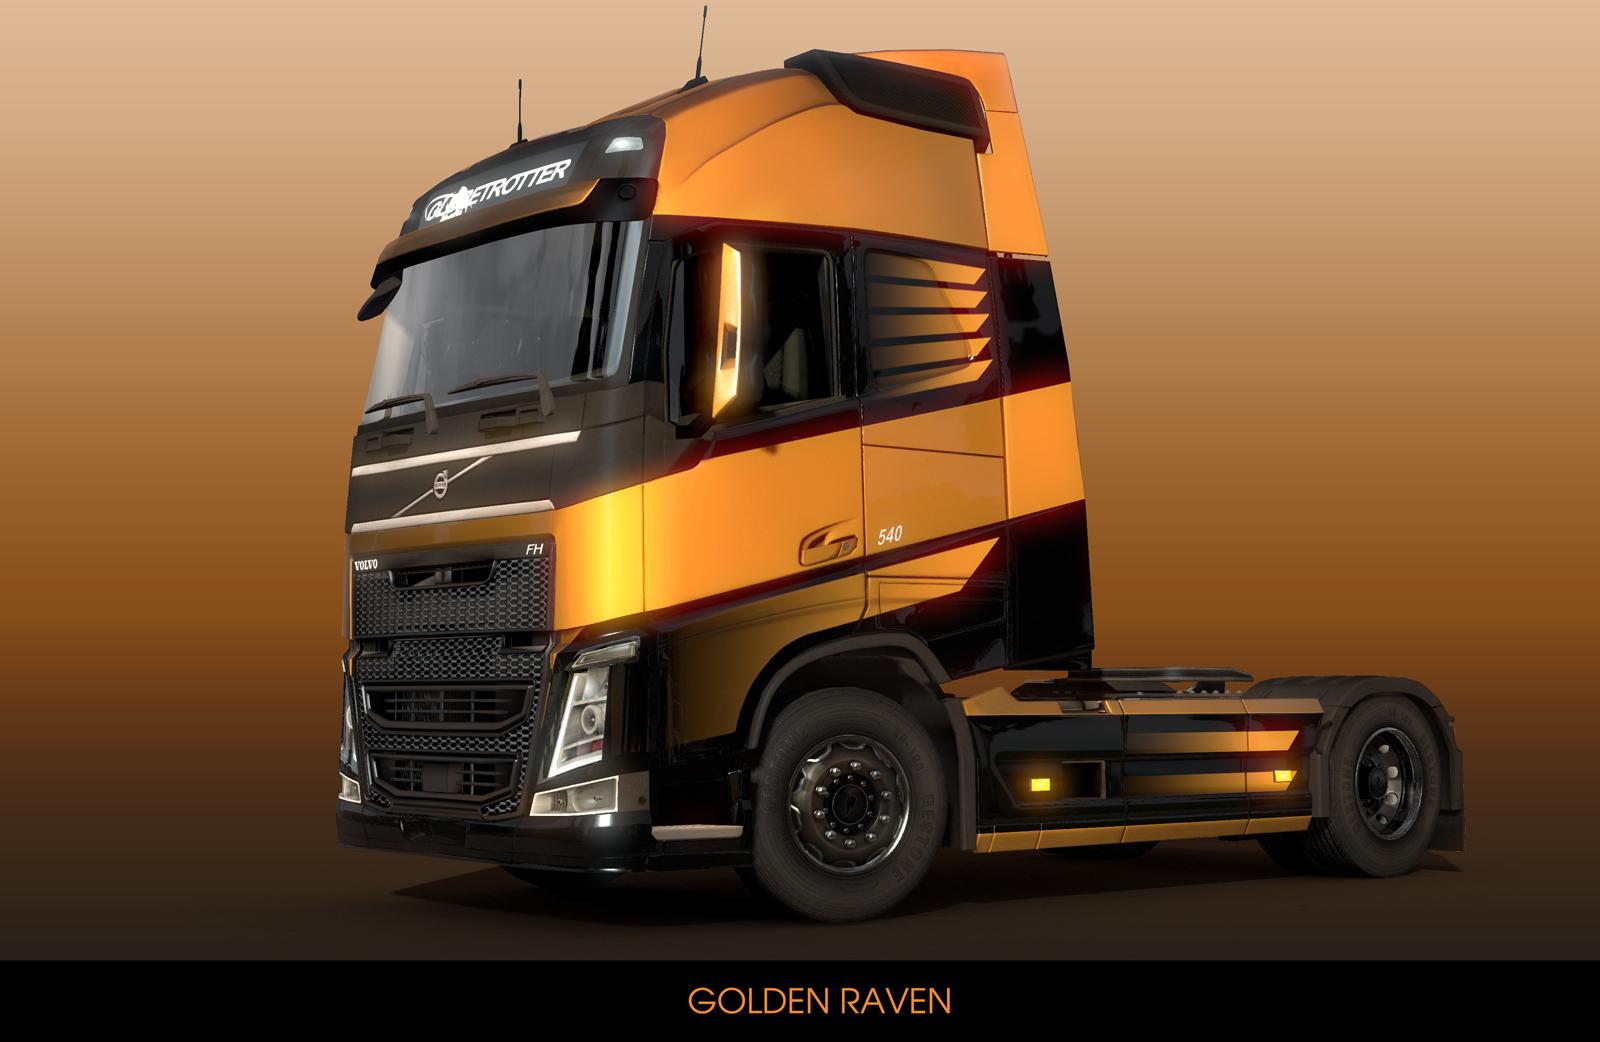 ets2_golden_raven_paintjob_dlc_002.jpg